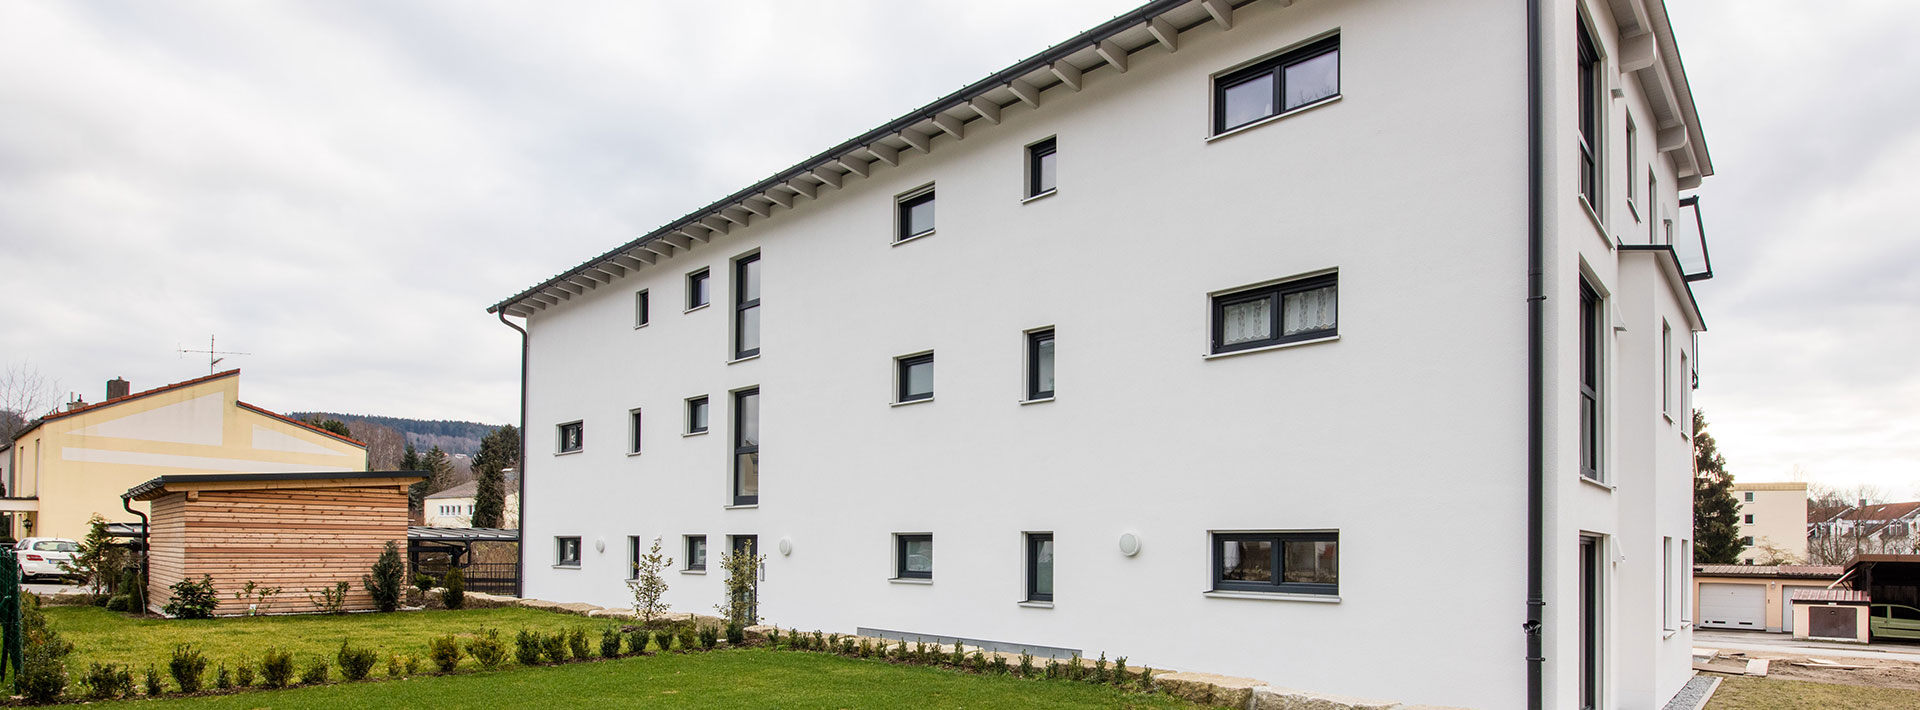 Wohnungsbau in Deggendorf